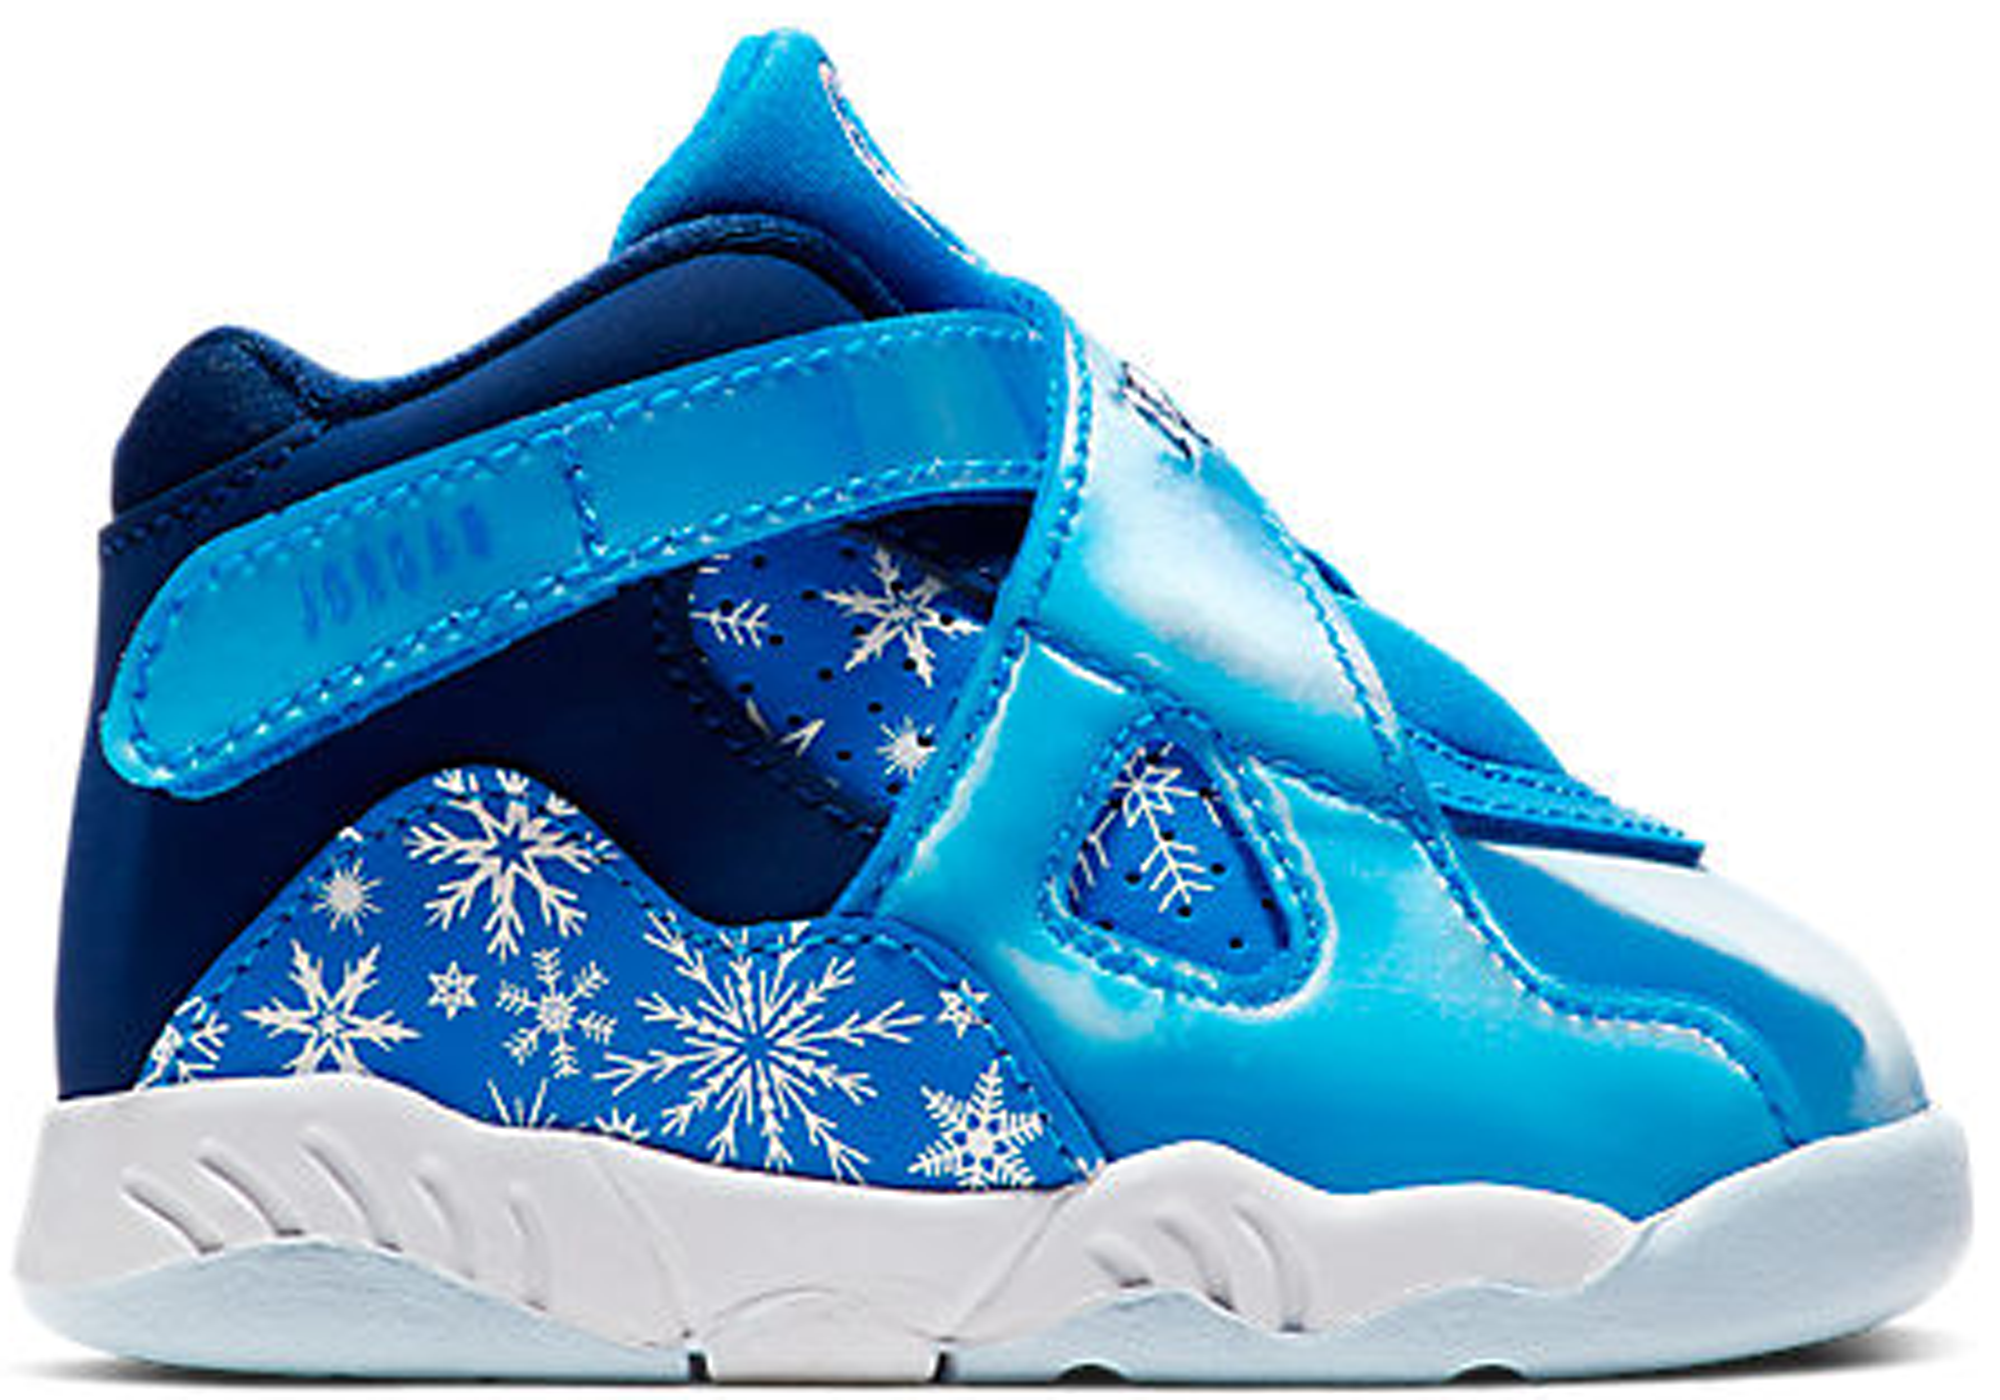 Jordan 8 Retro Snow Blizzard (TD)